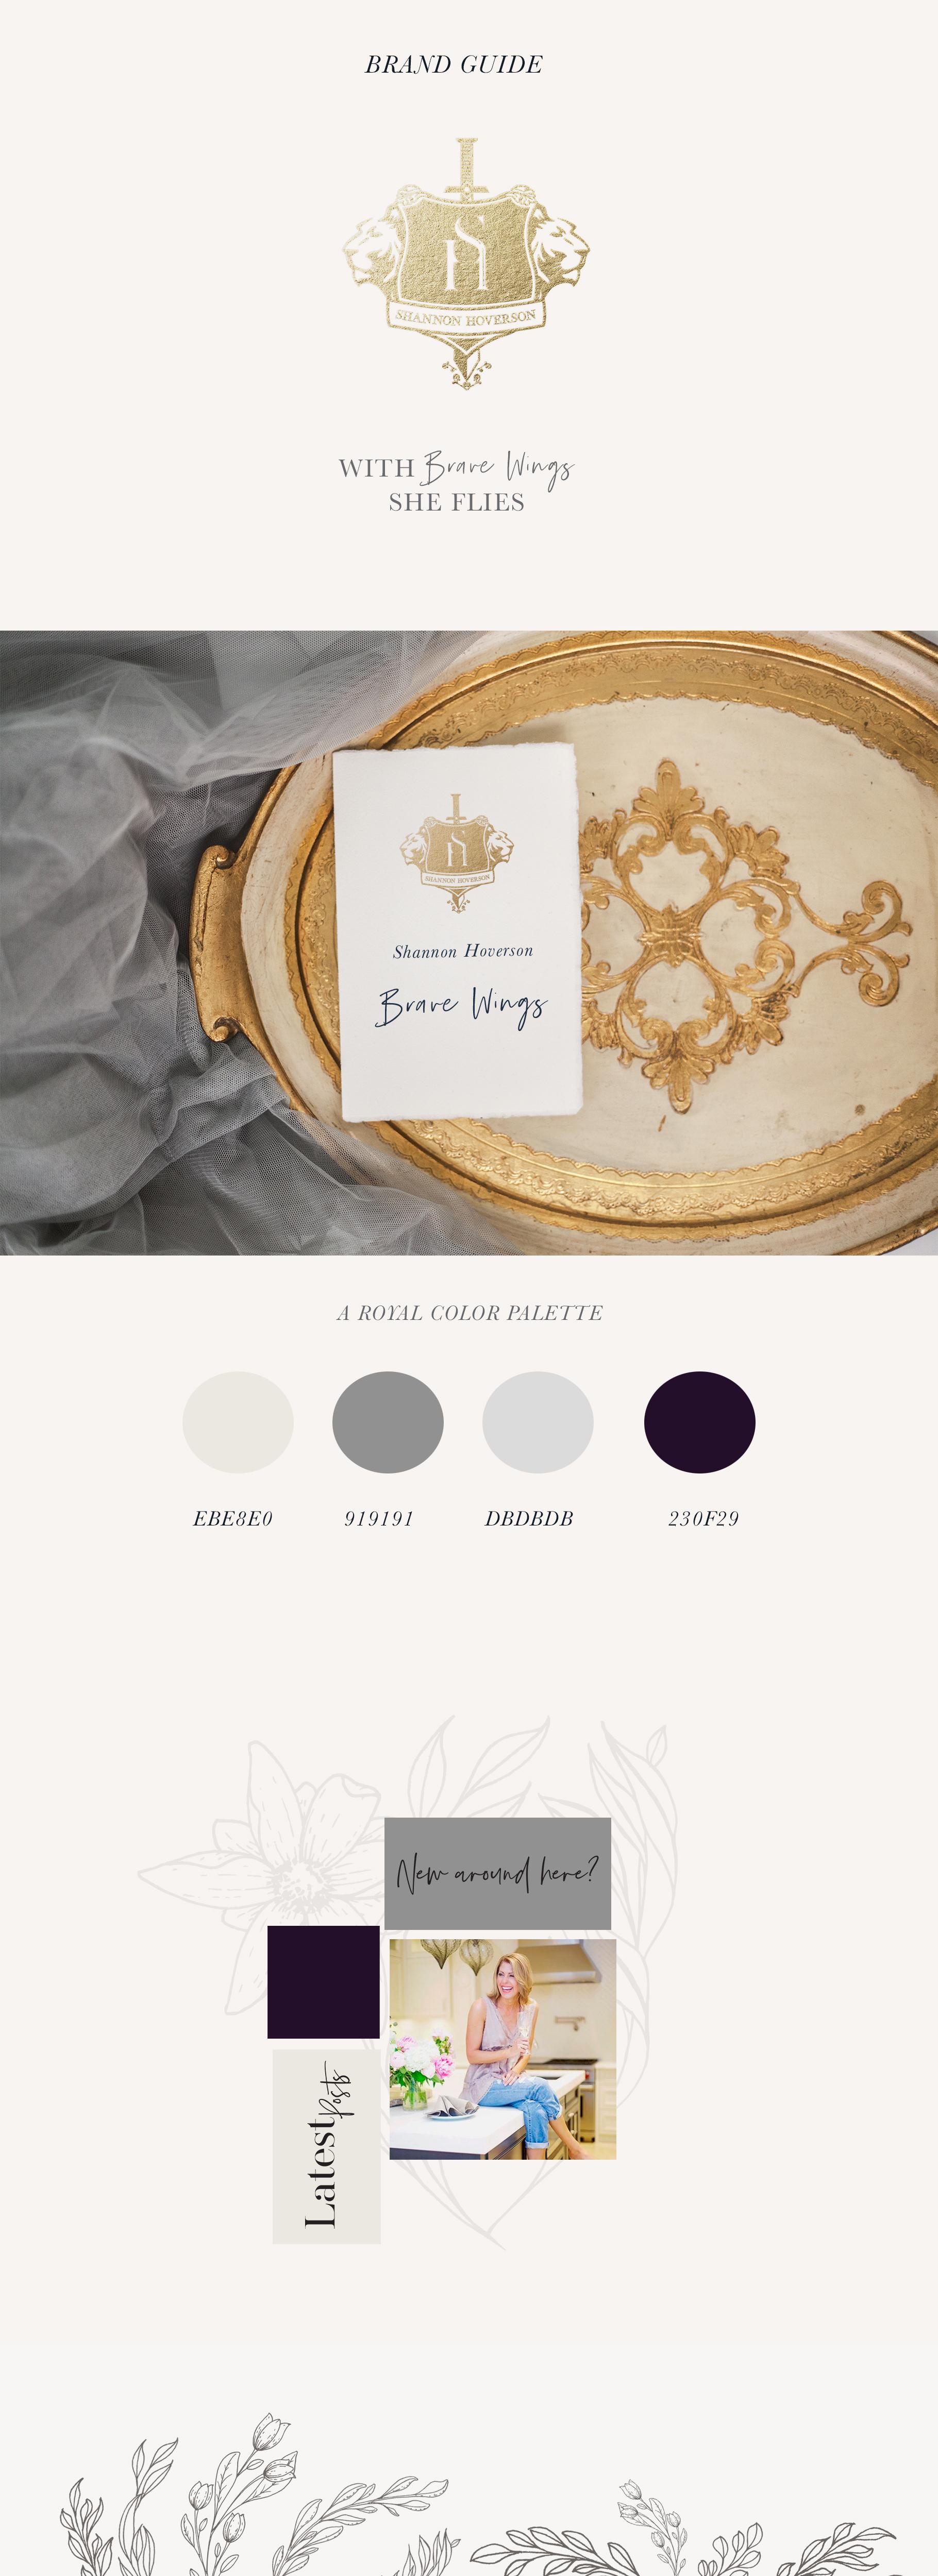 Branding Board-Shannon Hoverson.jpg